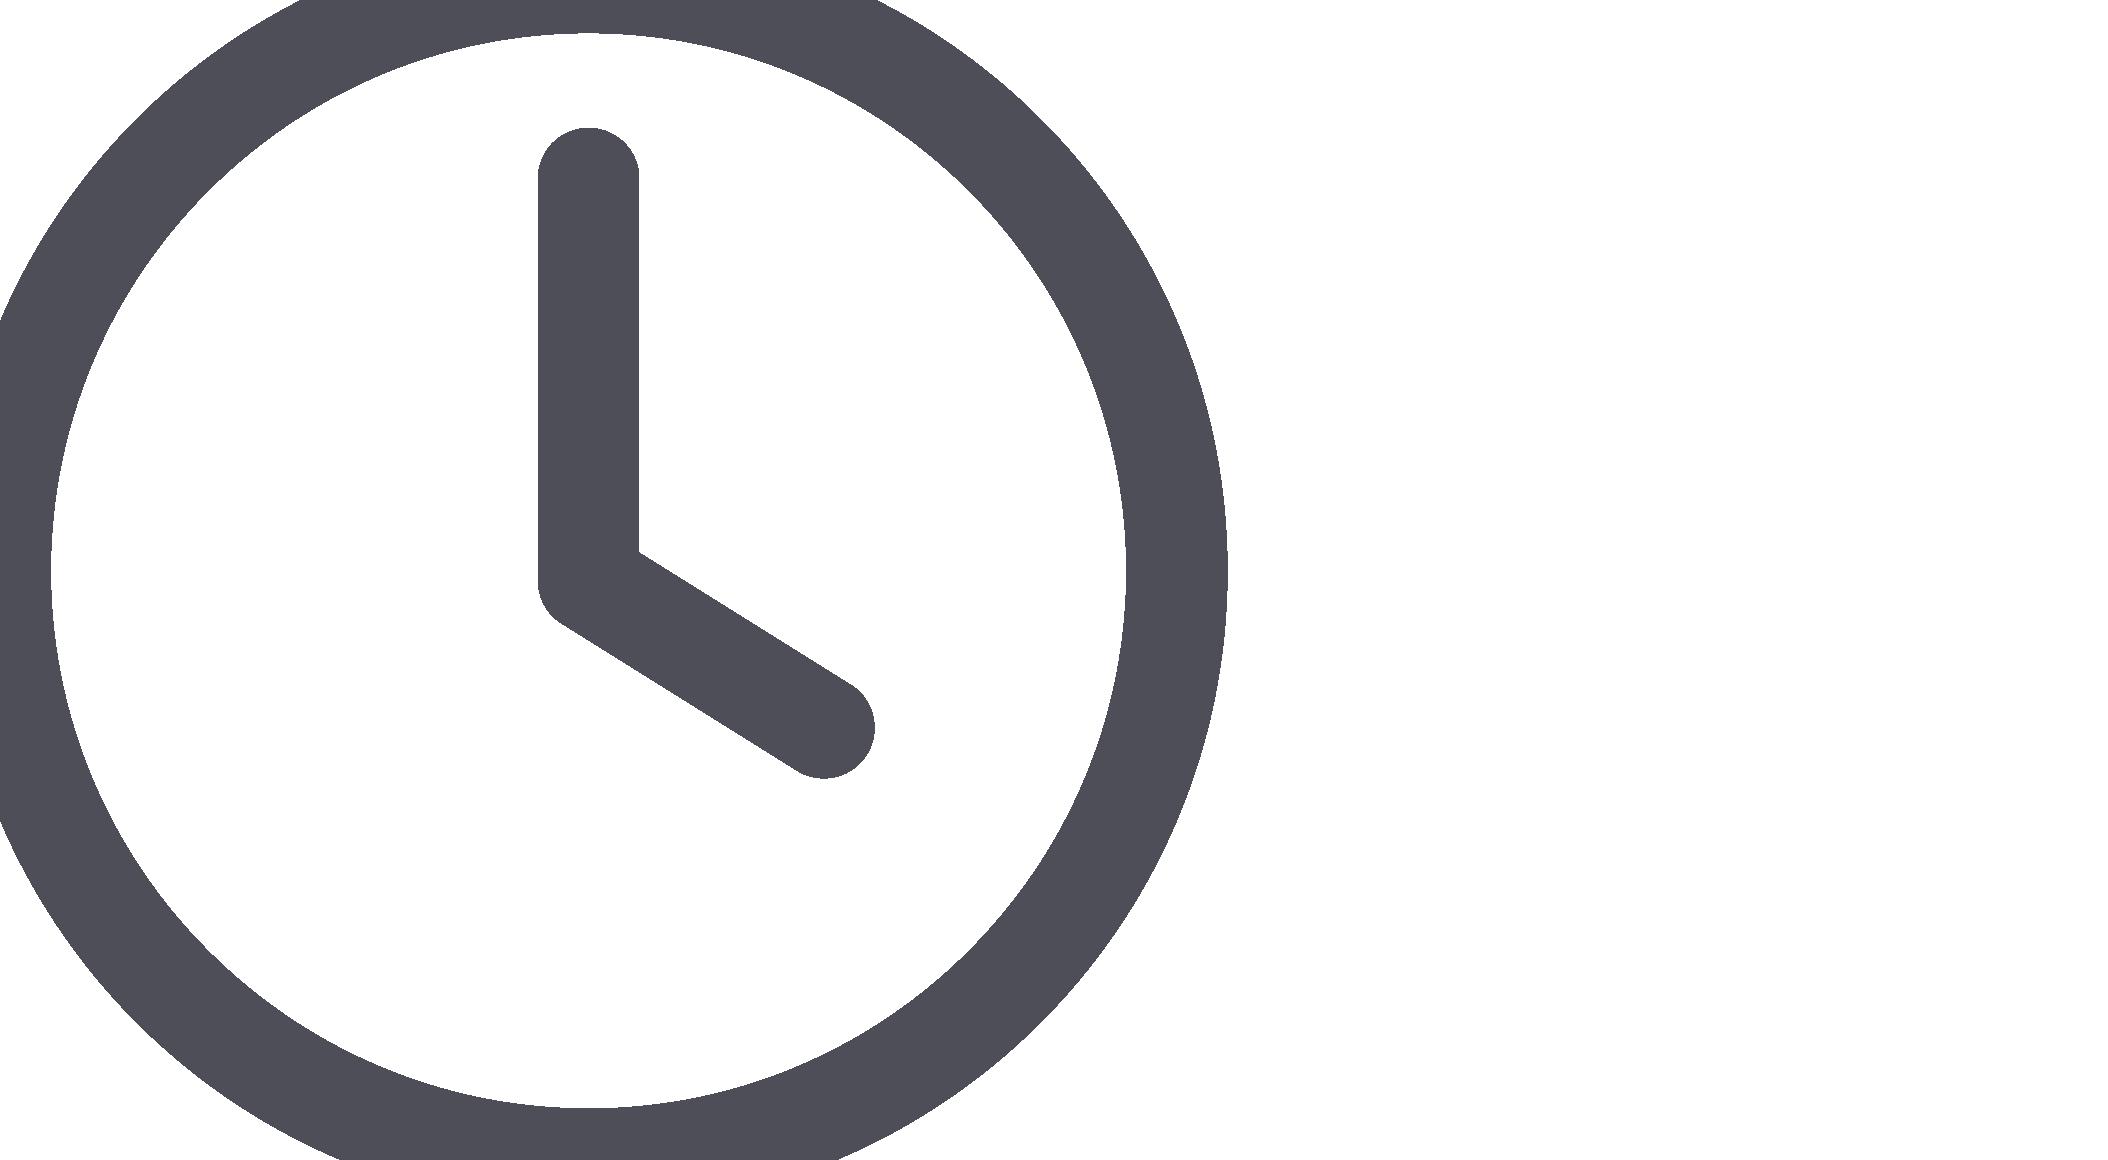 localgov-clock-background-grey-01